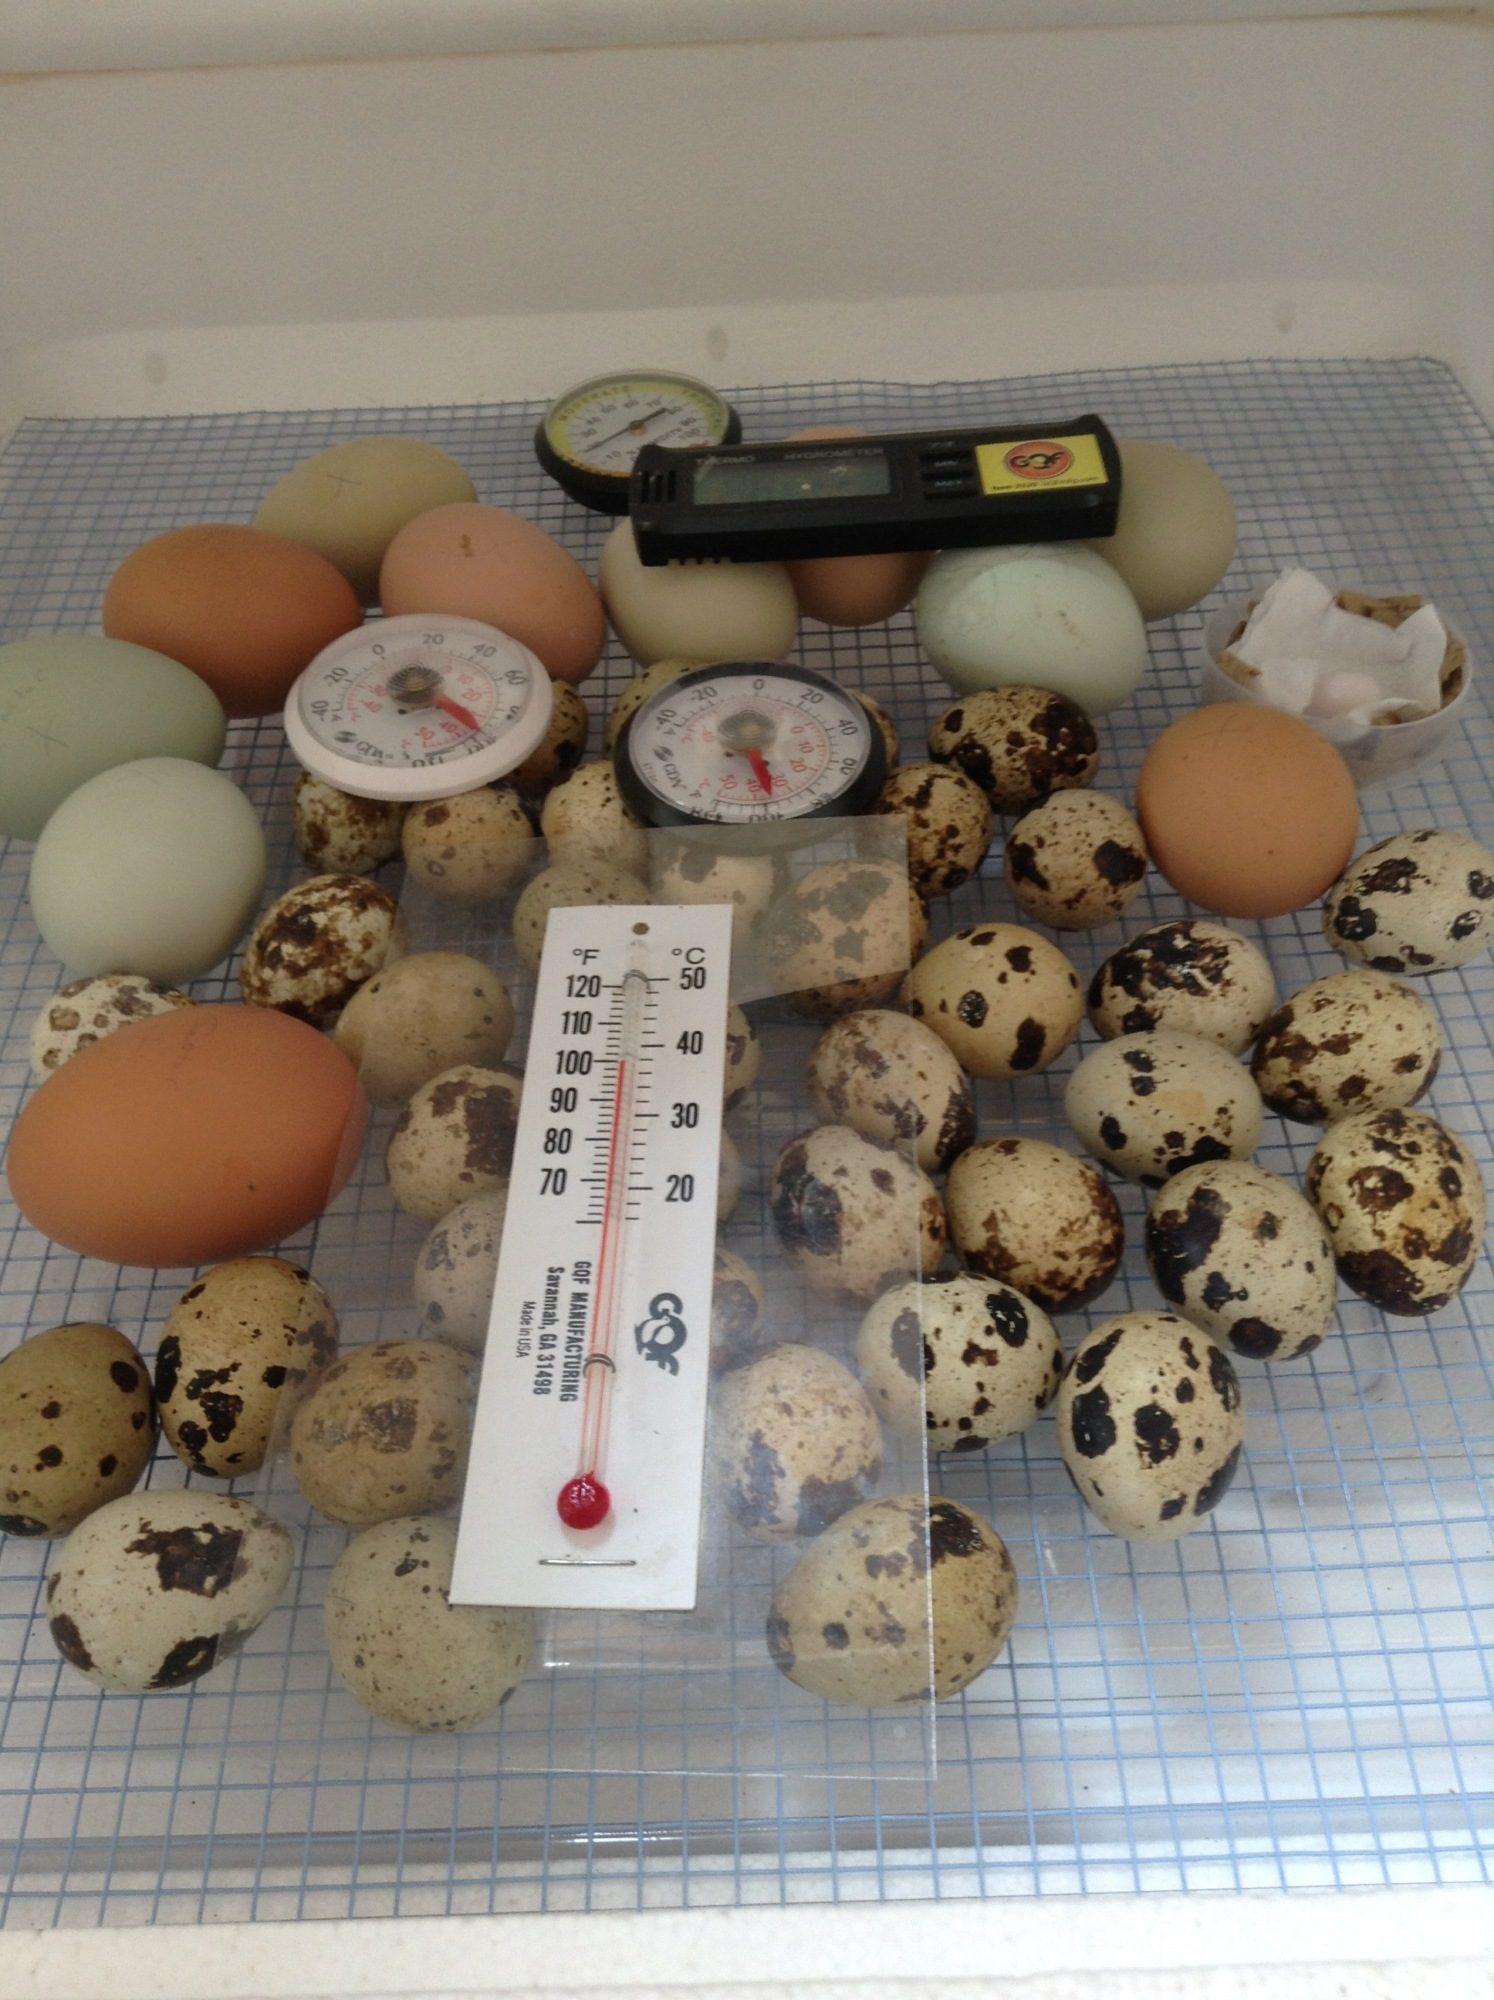 My incubators